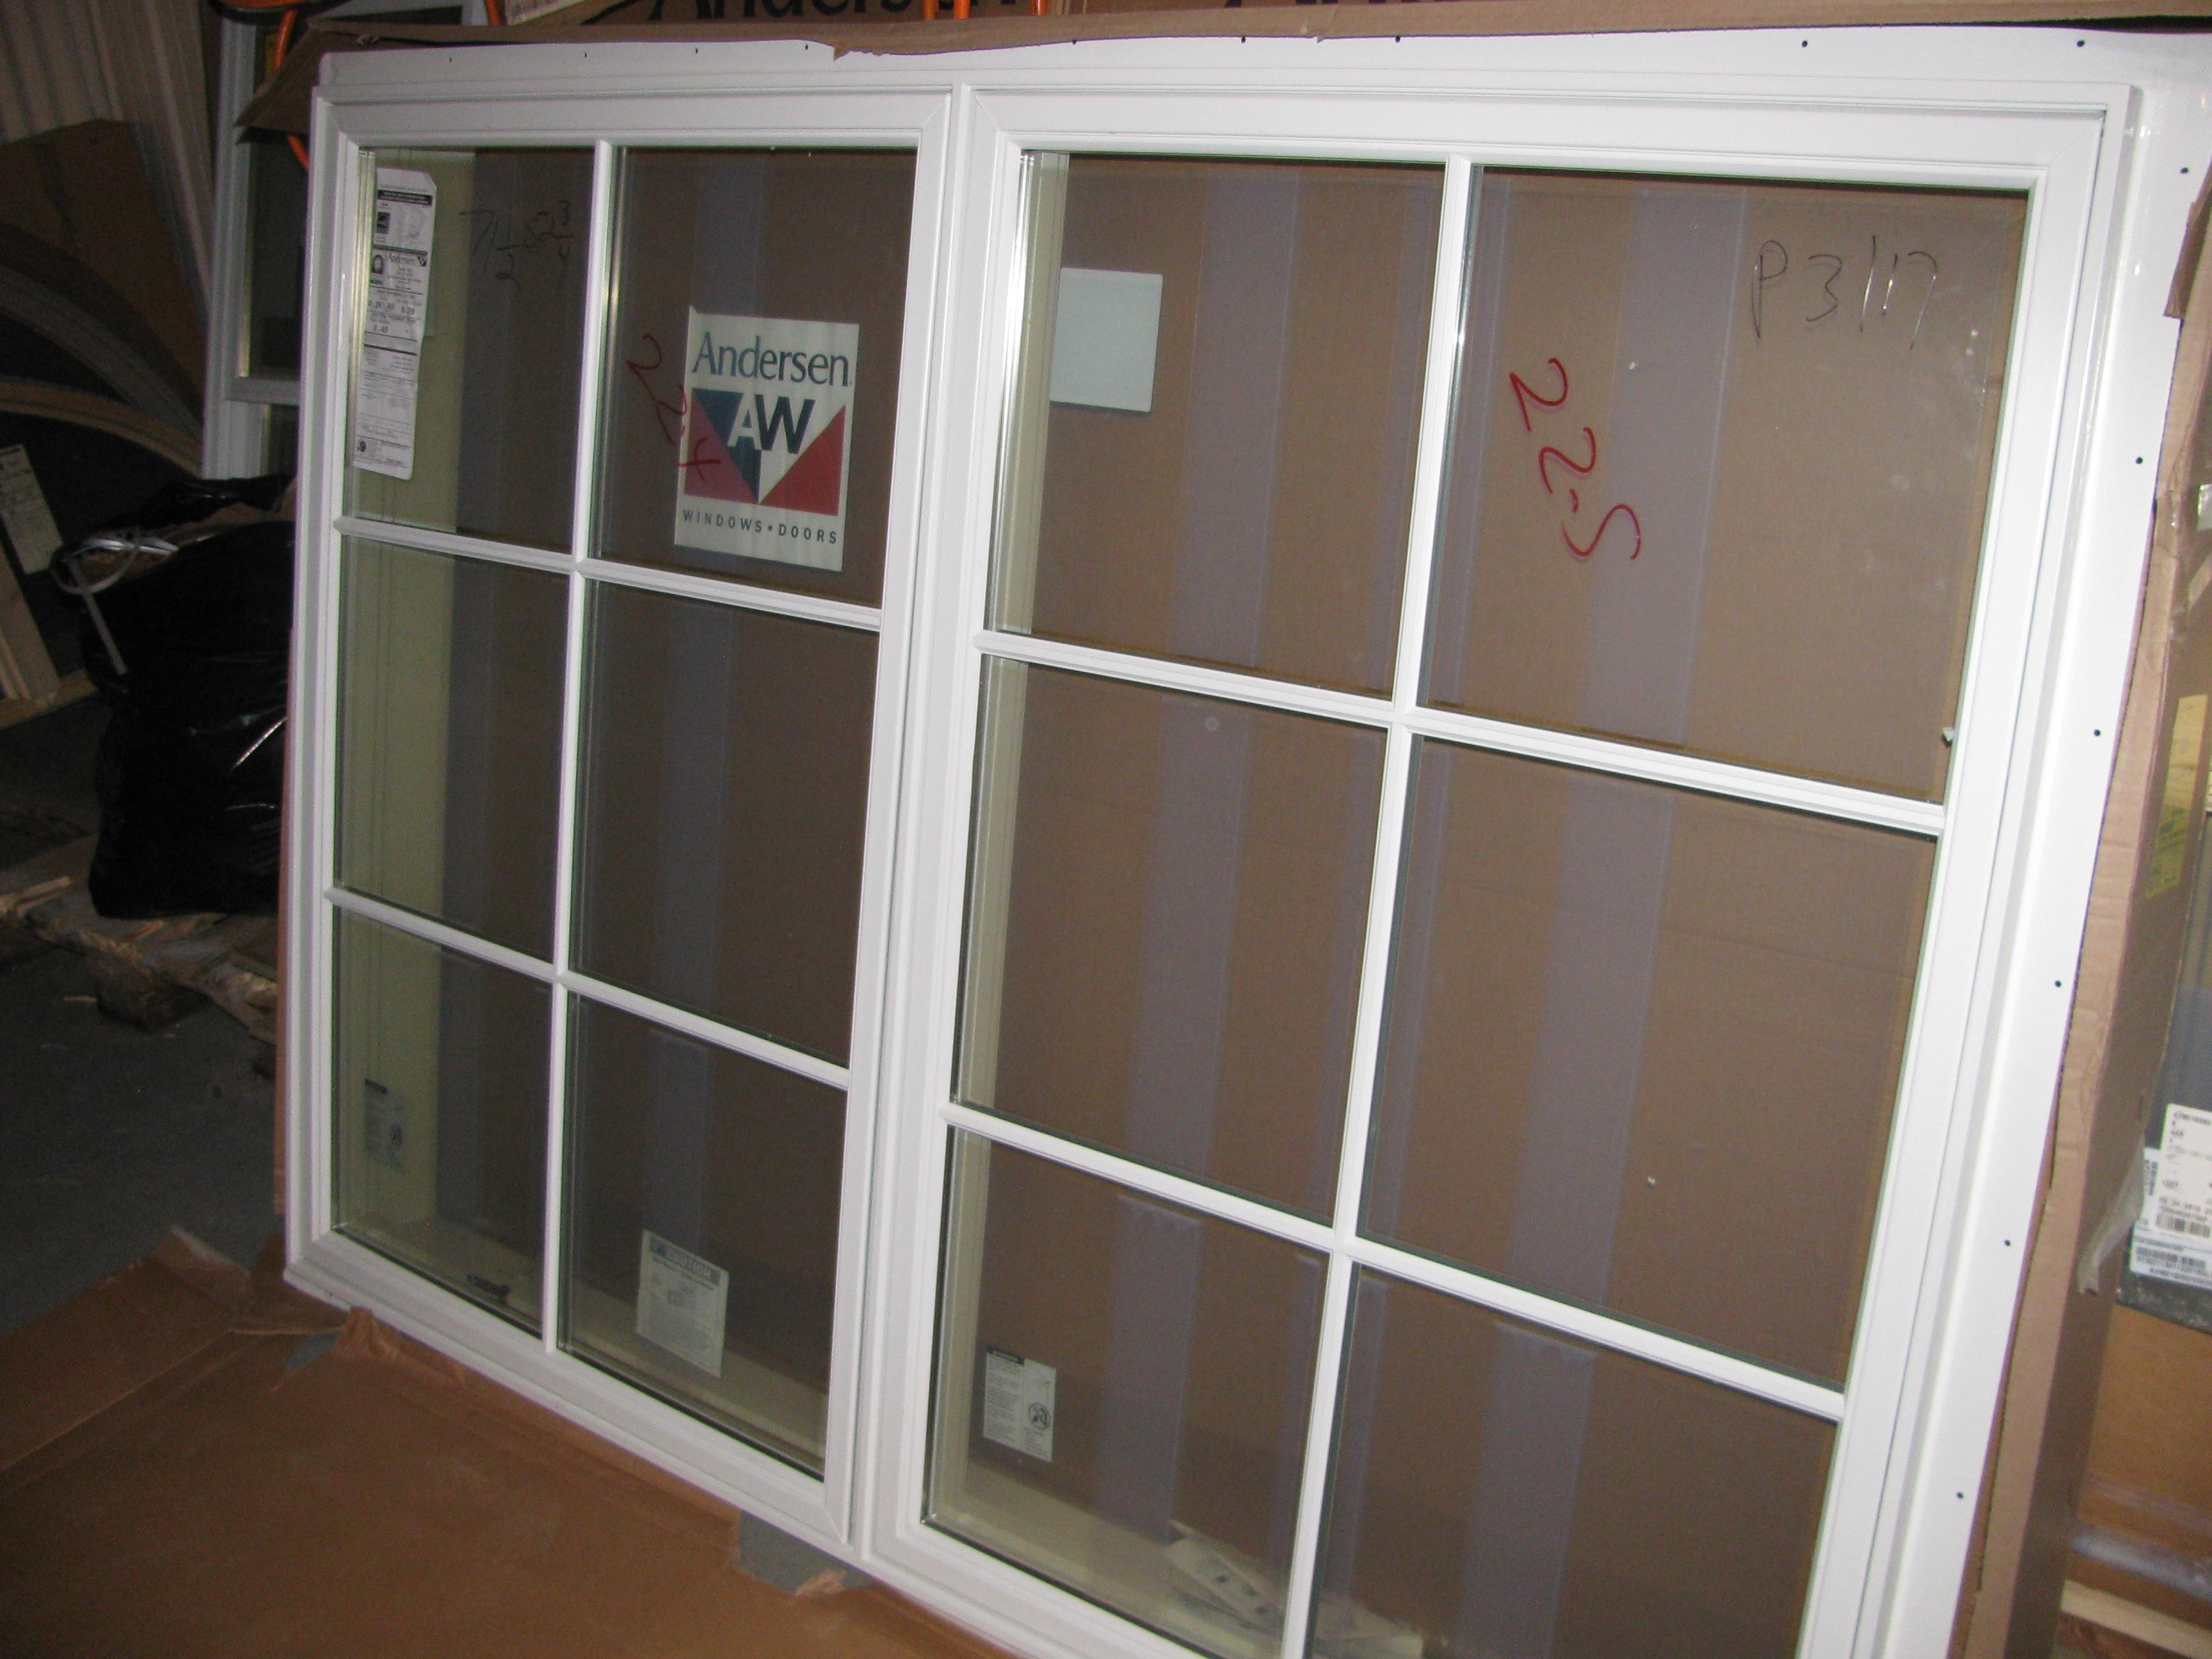 14 new white andersen sdl casement window package for Andersen windows u factor